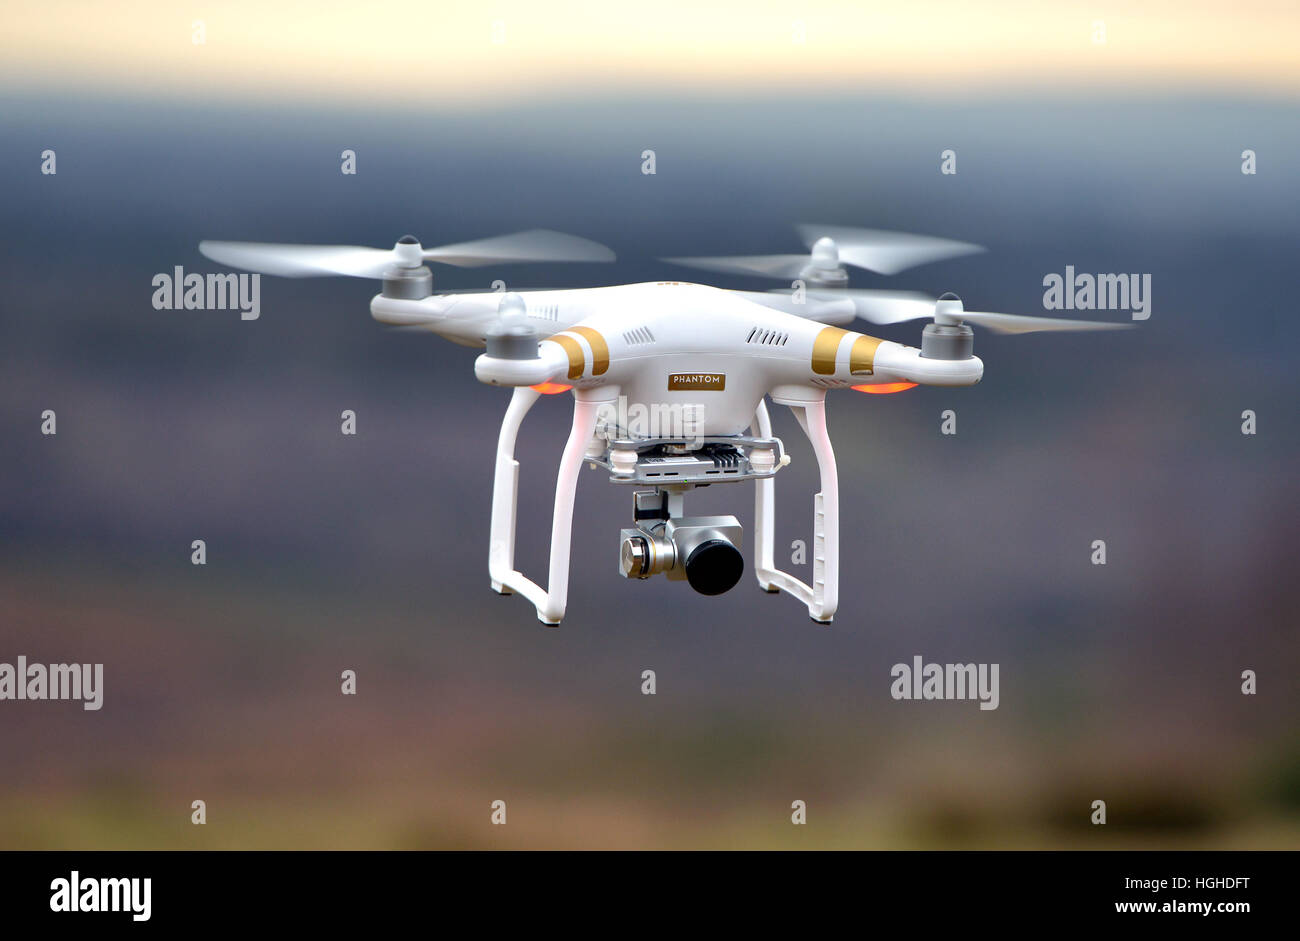 Drone in flight - DJI Phantom 3 - Stock Image